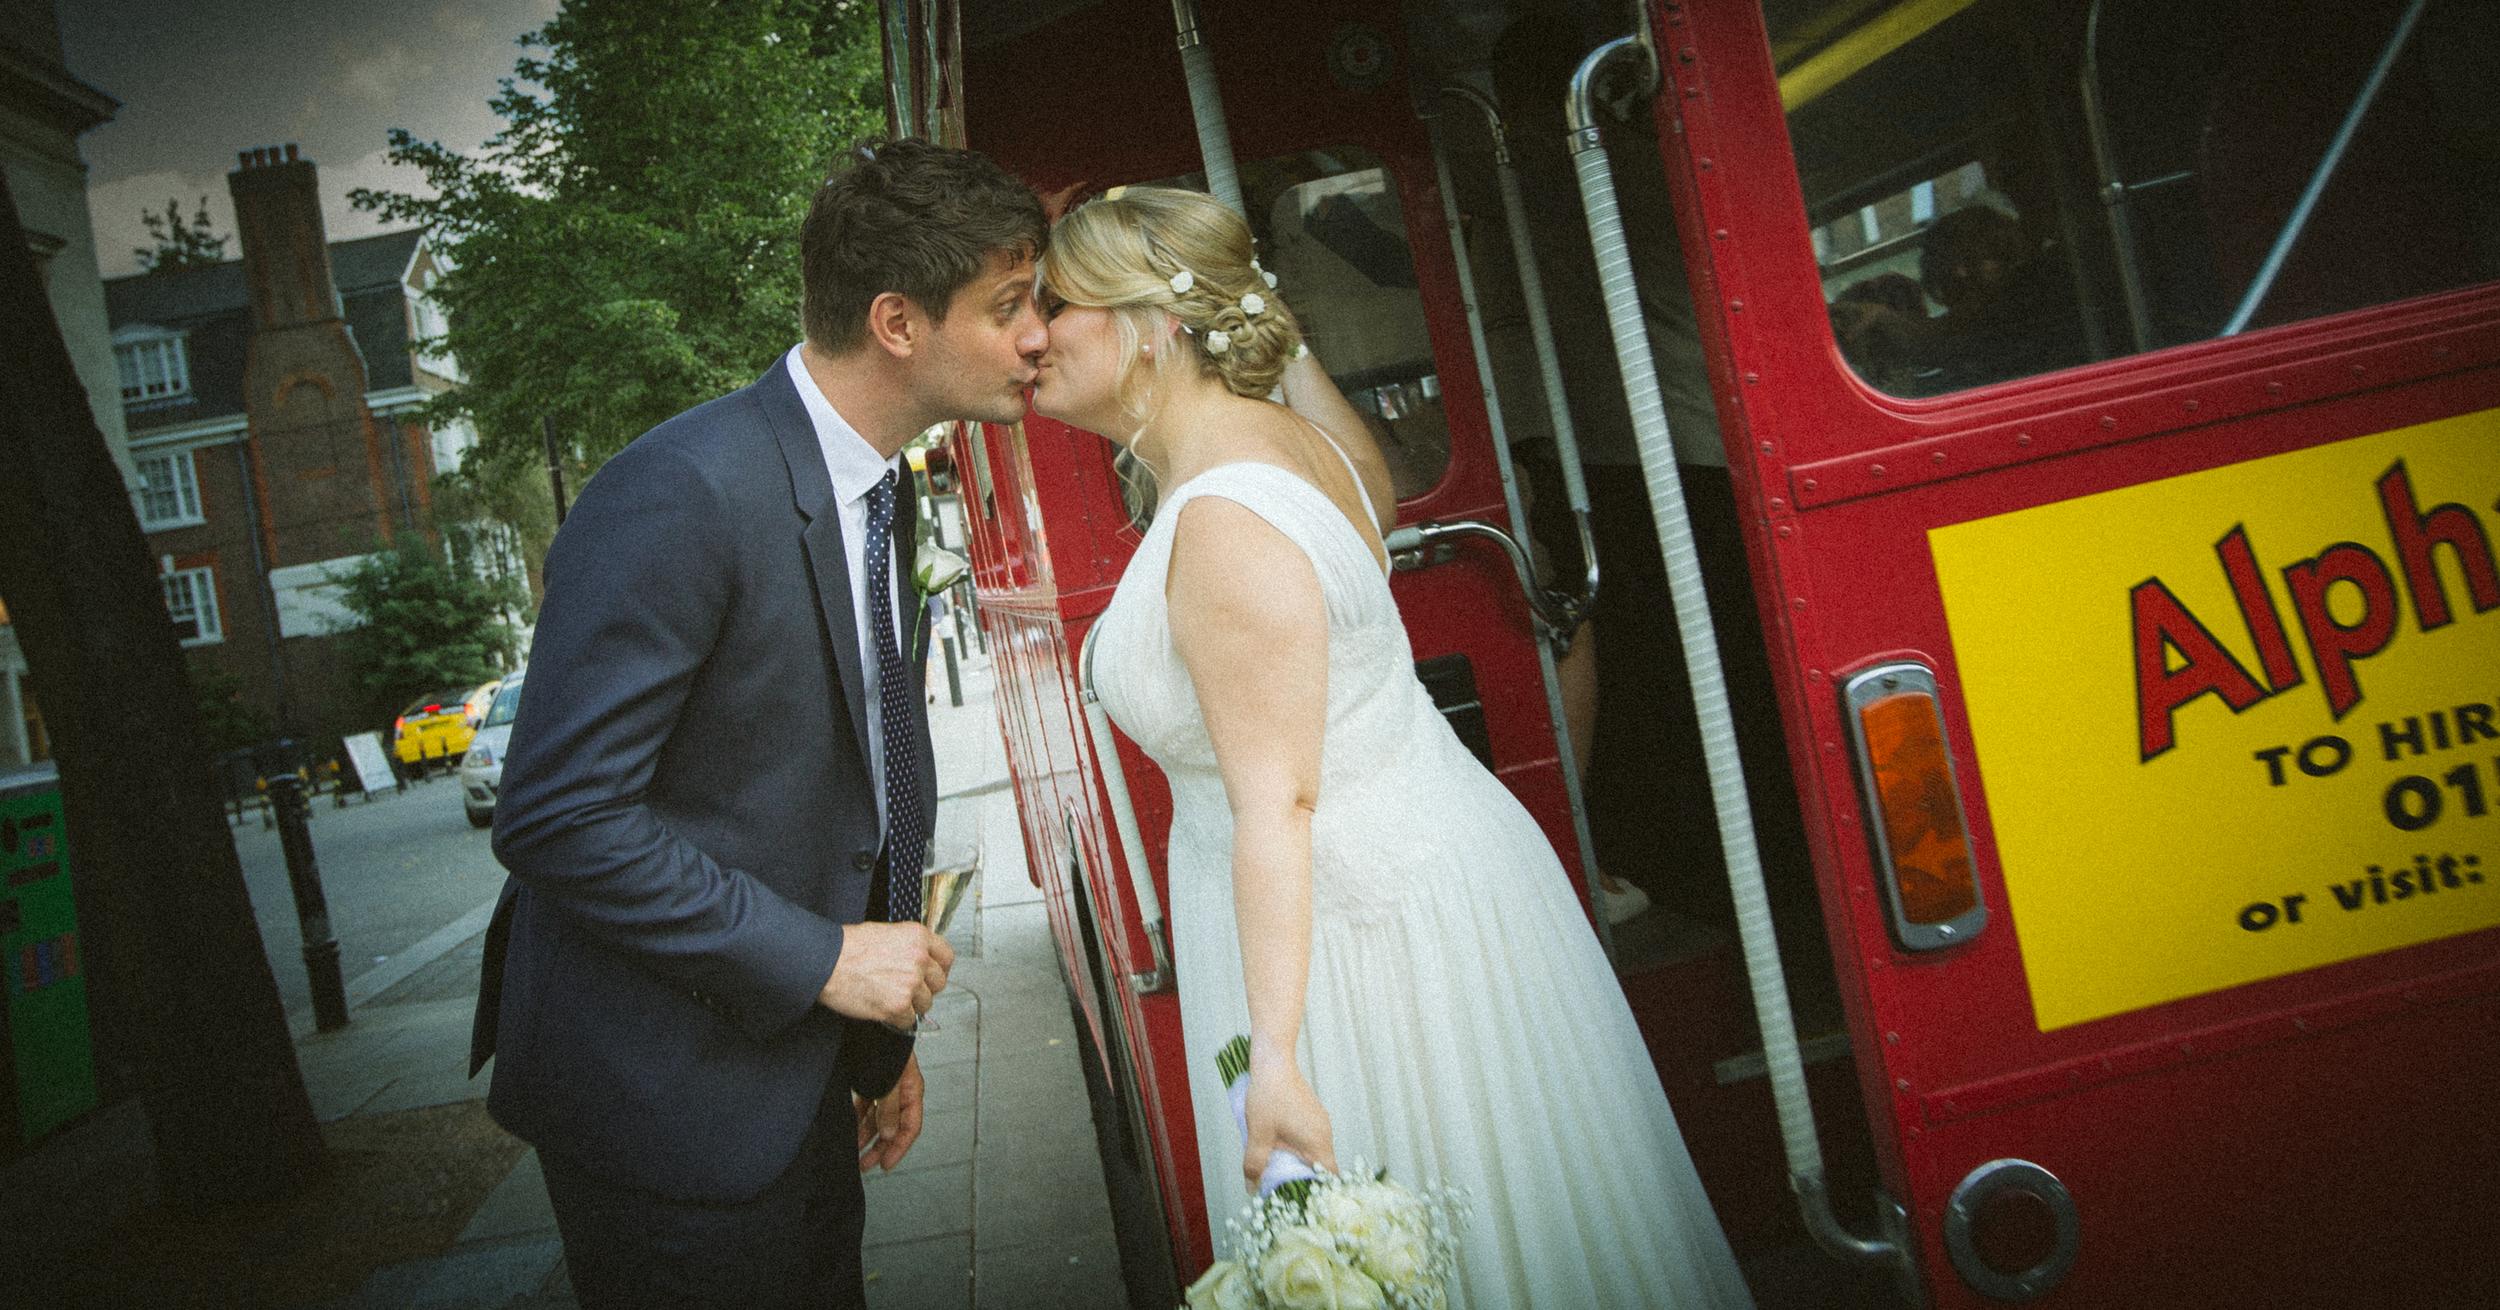 routemaster-bus-romantic-kiss-vintage-wedding-1